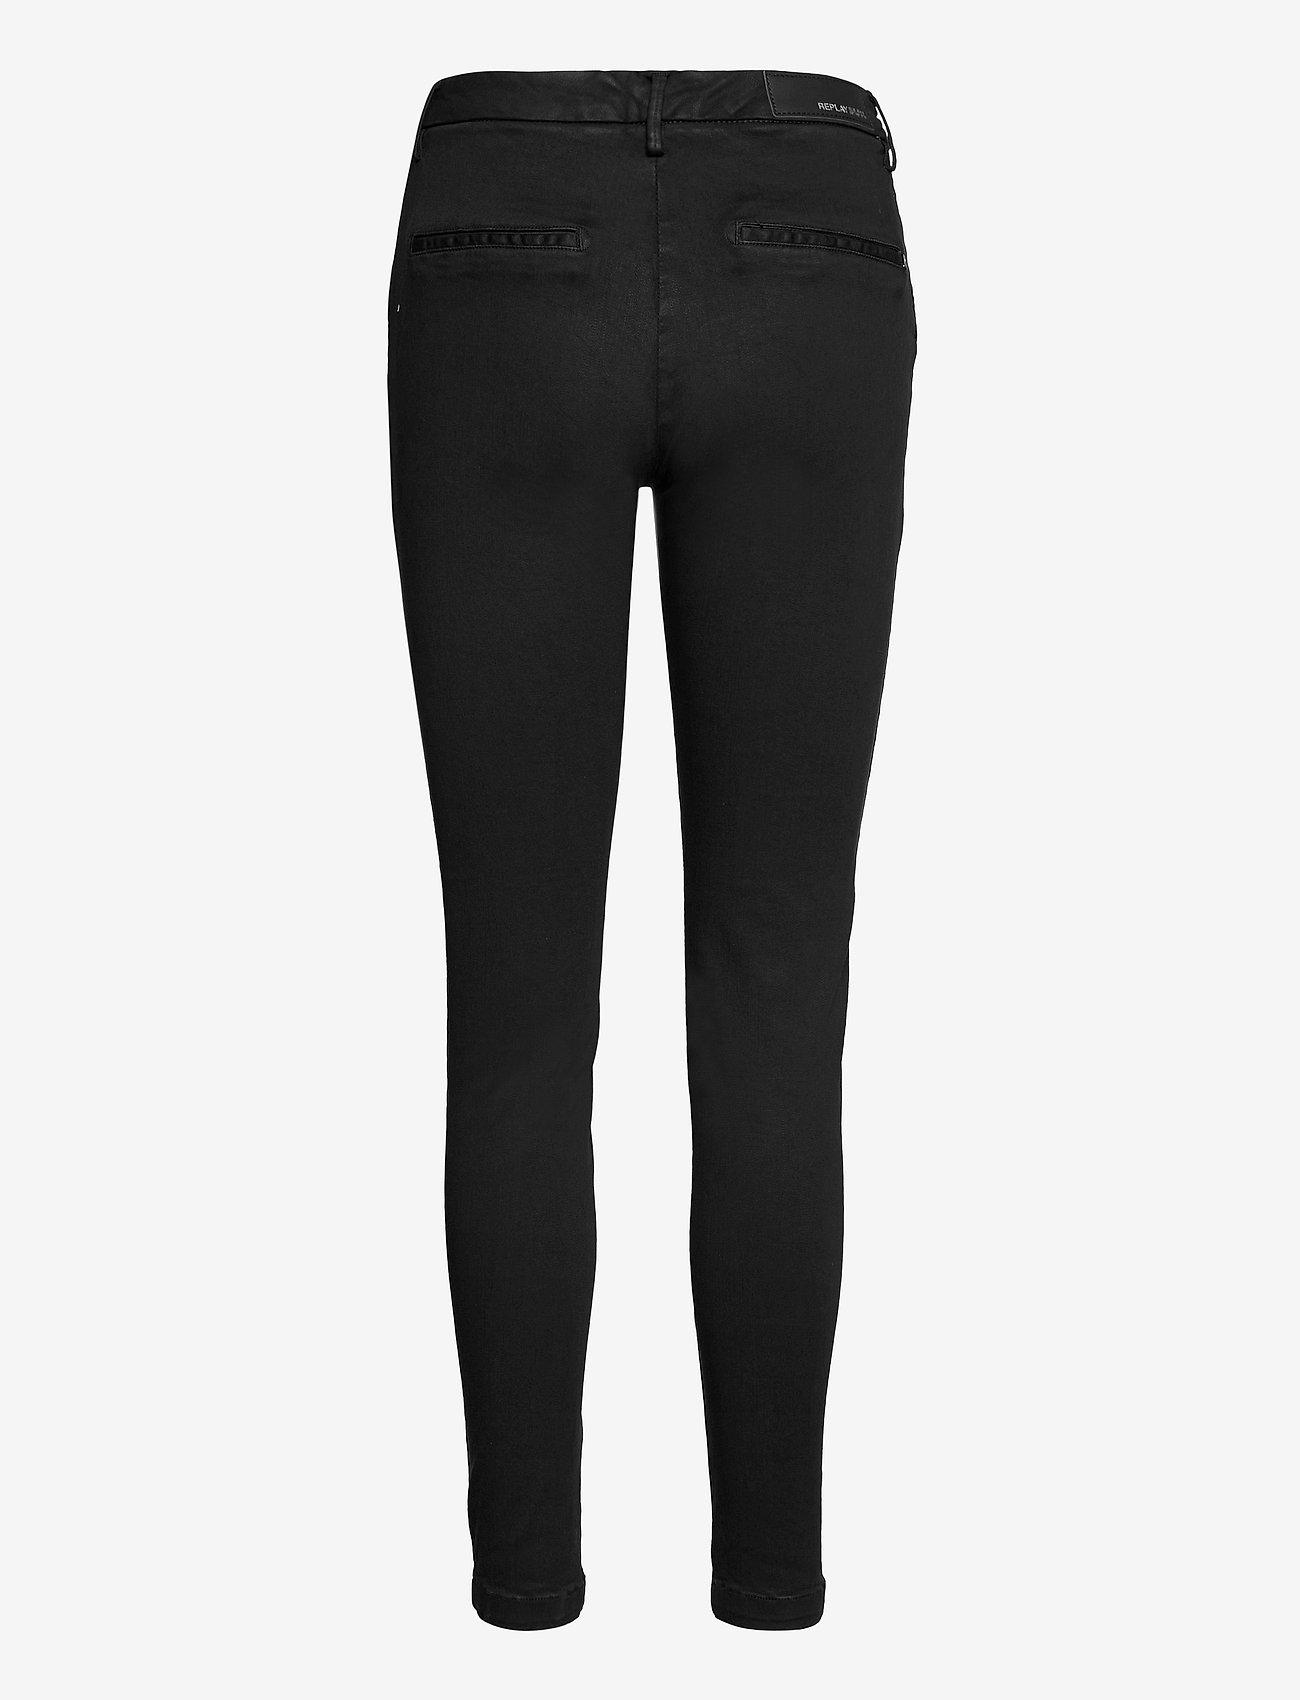 Replay - LYSA HYPERFLEX - slim jeans - black. - 1